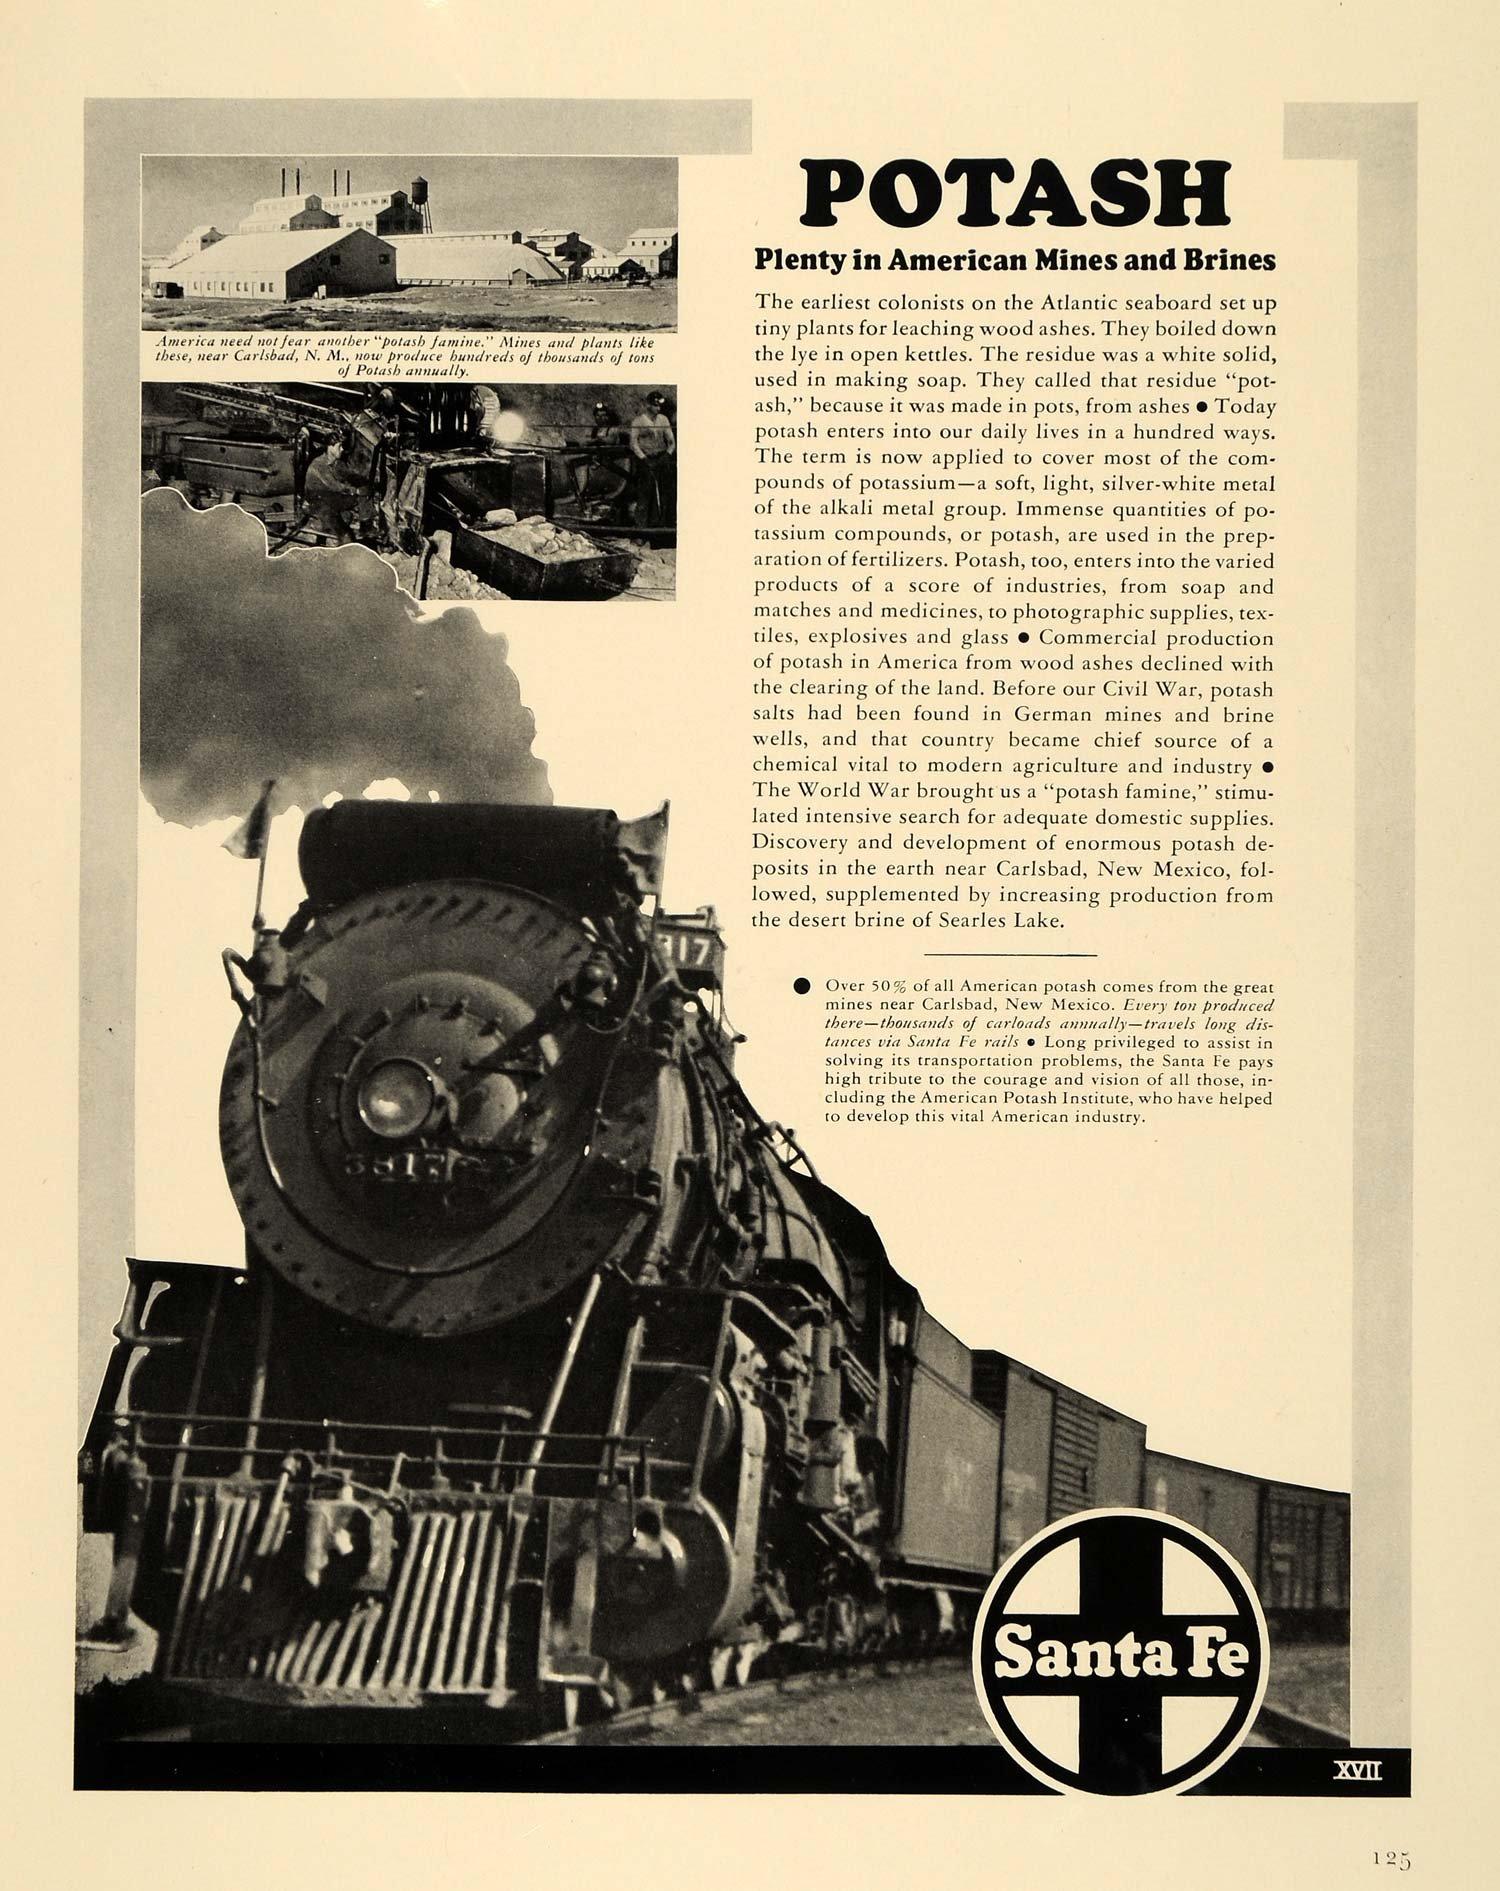 Buy American Potash Now!